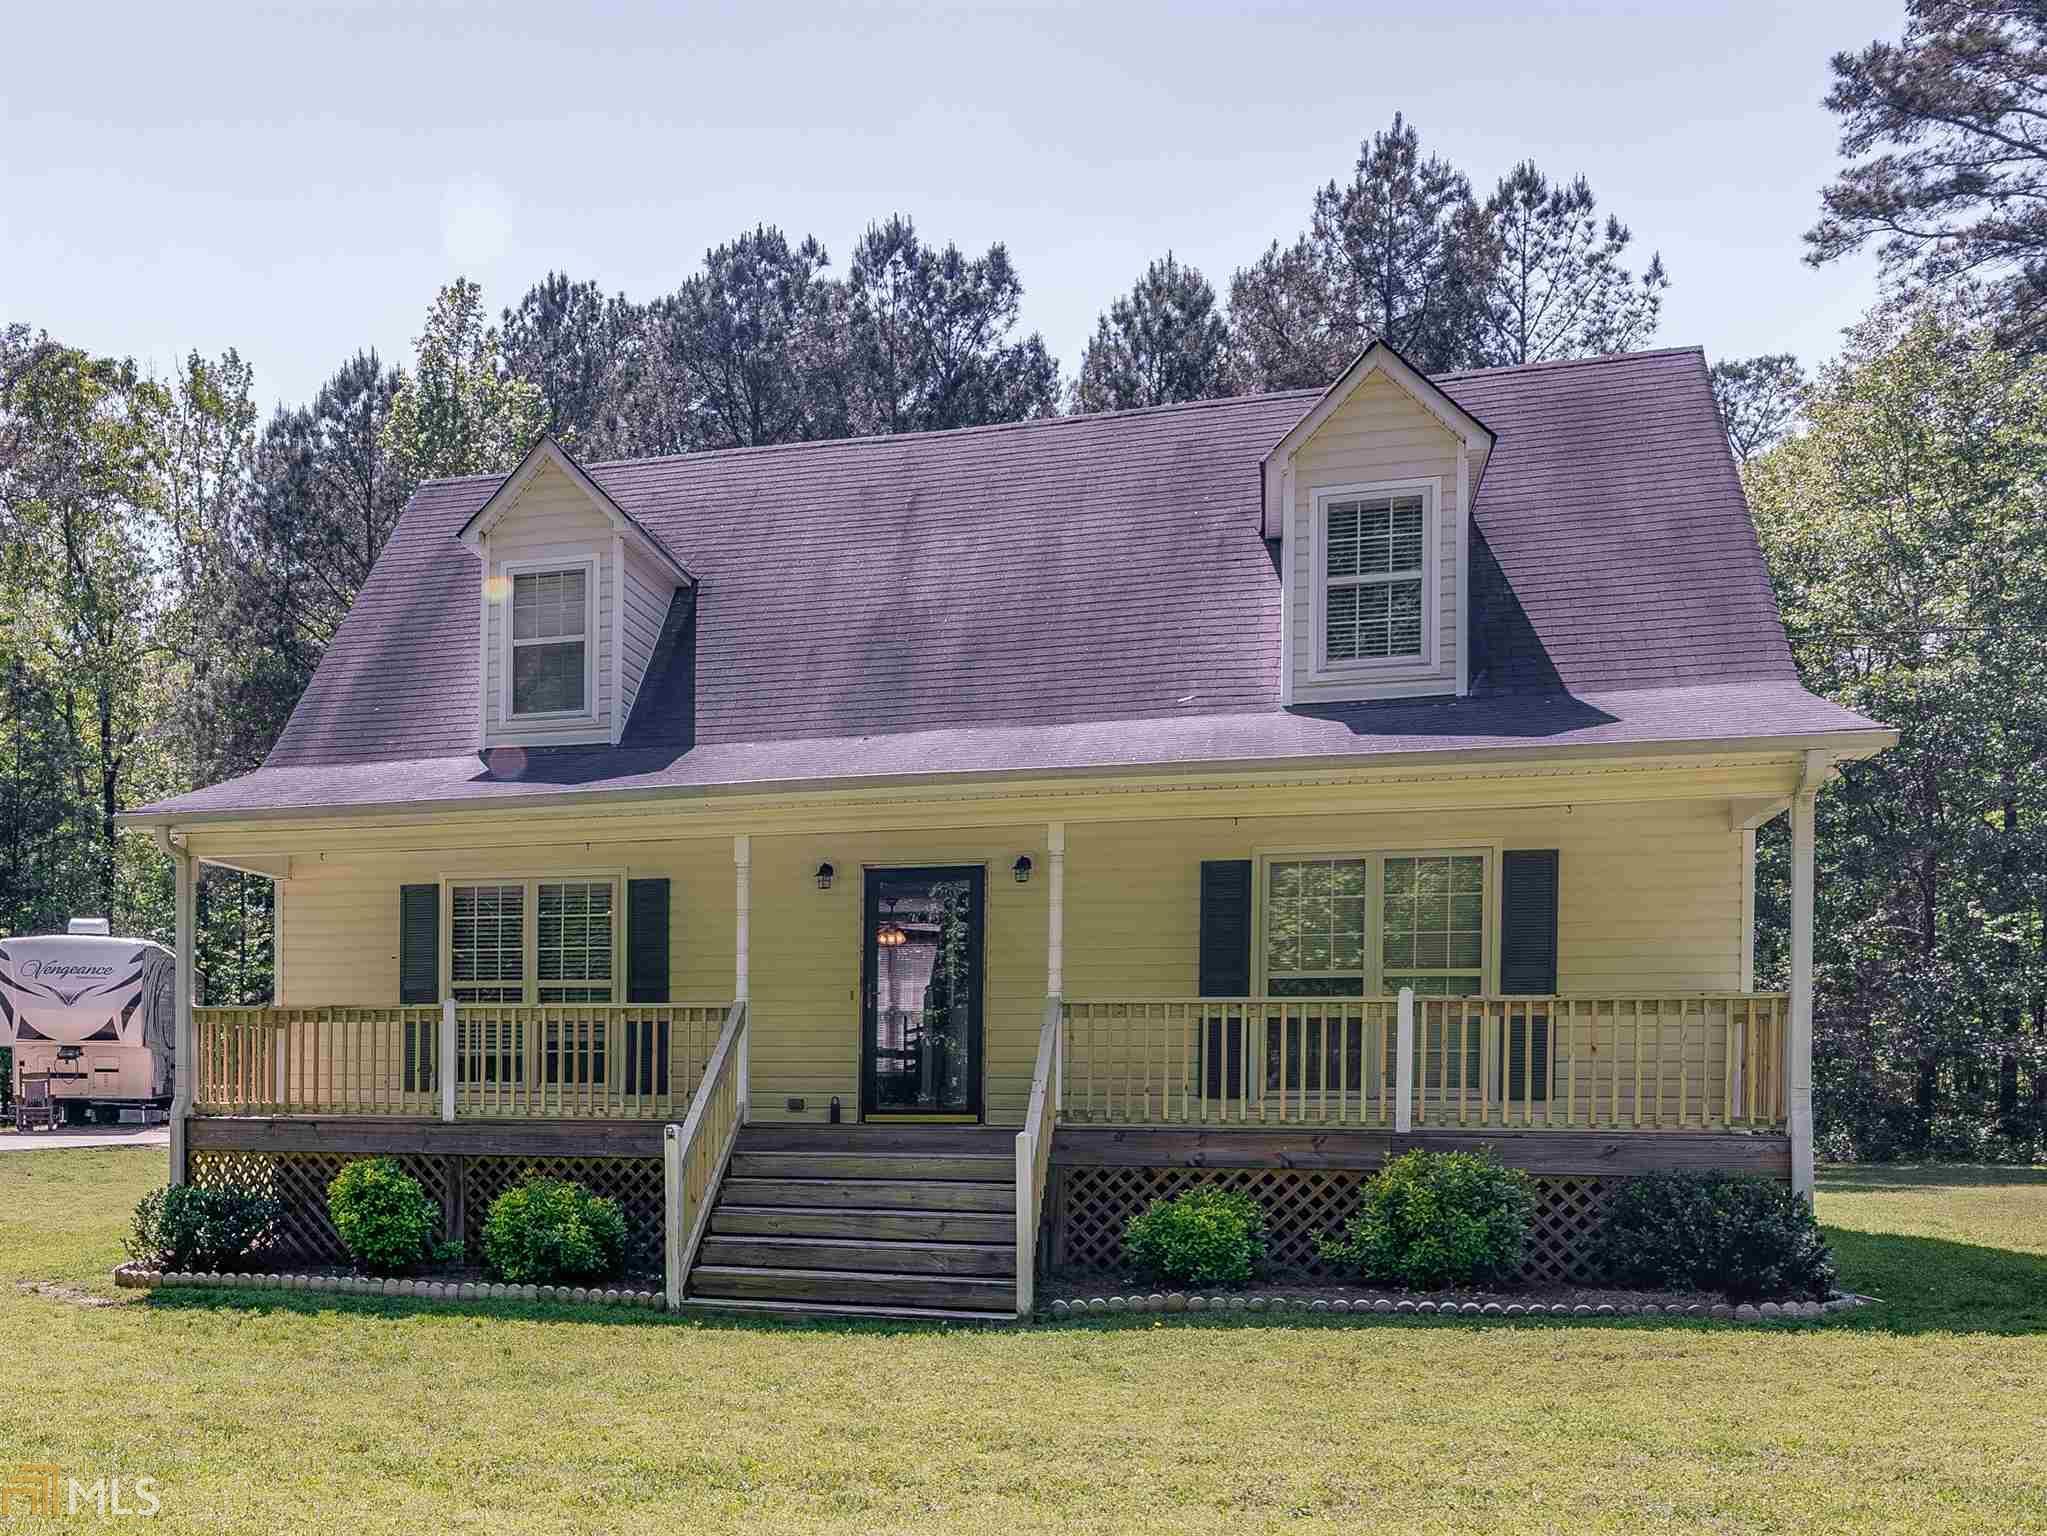 275 Mackey Rd, McDonough, Georgia 30252, 3 Bedrooms Bedrooms, ,3 BathroomsBathrooms,Single Family,For Sale,275 Mackey Rd,1.5,8965139